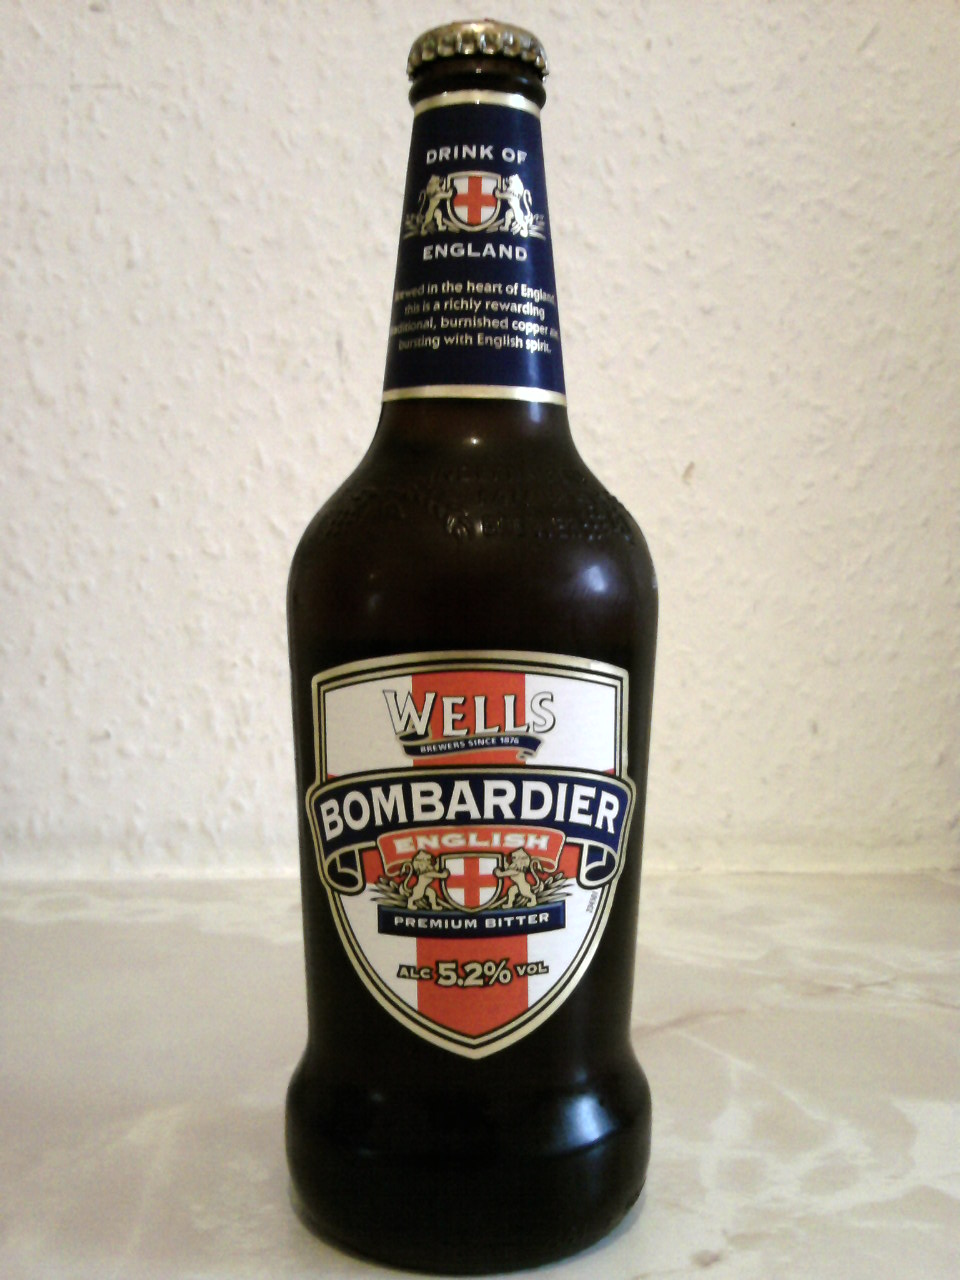 Wells Bombardier English Premium Bitter bottle